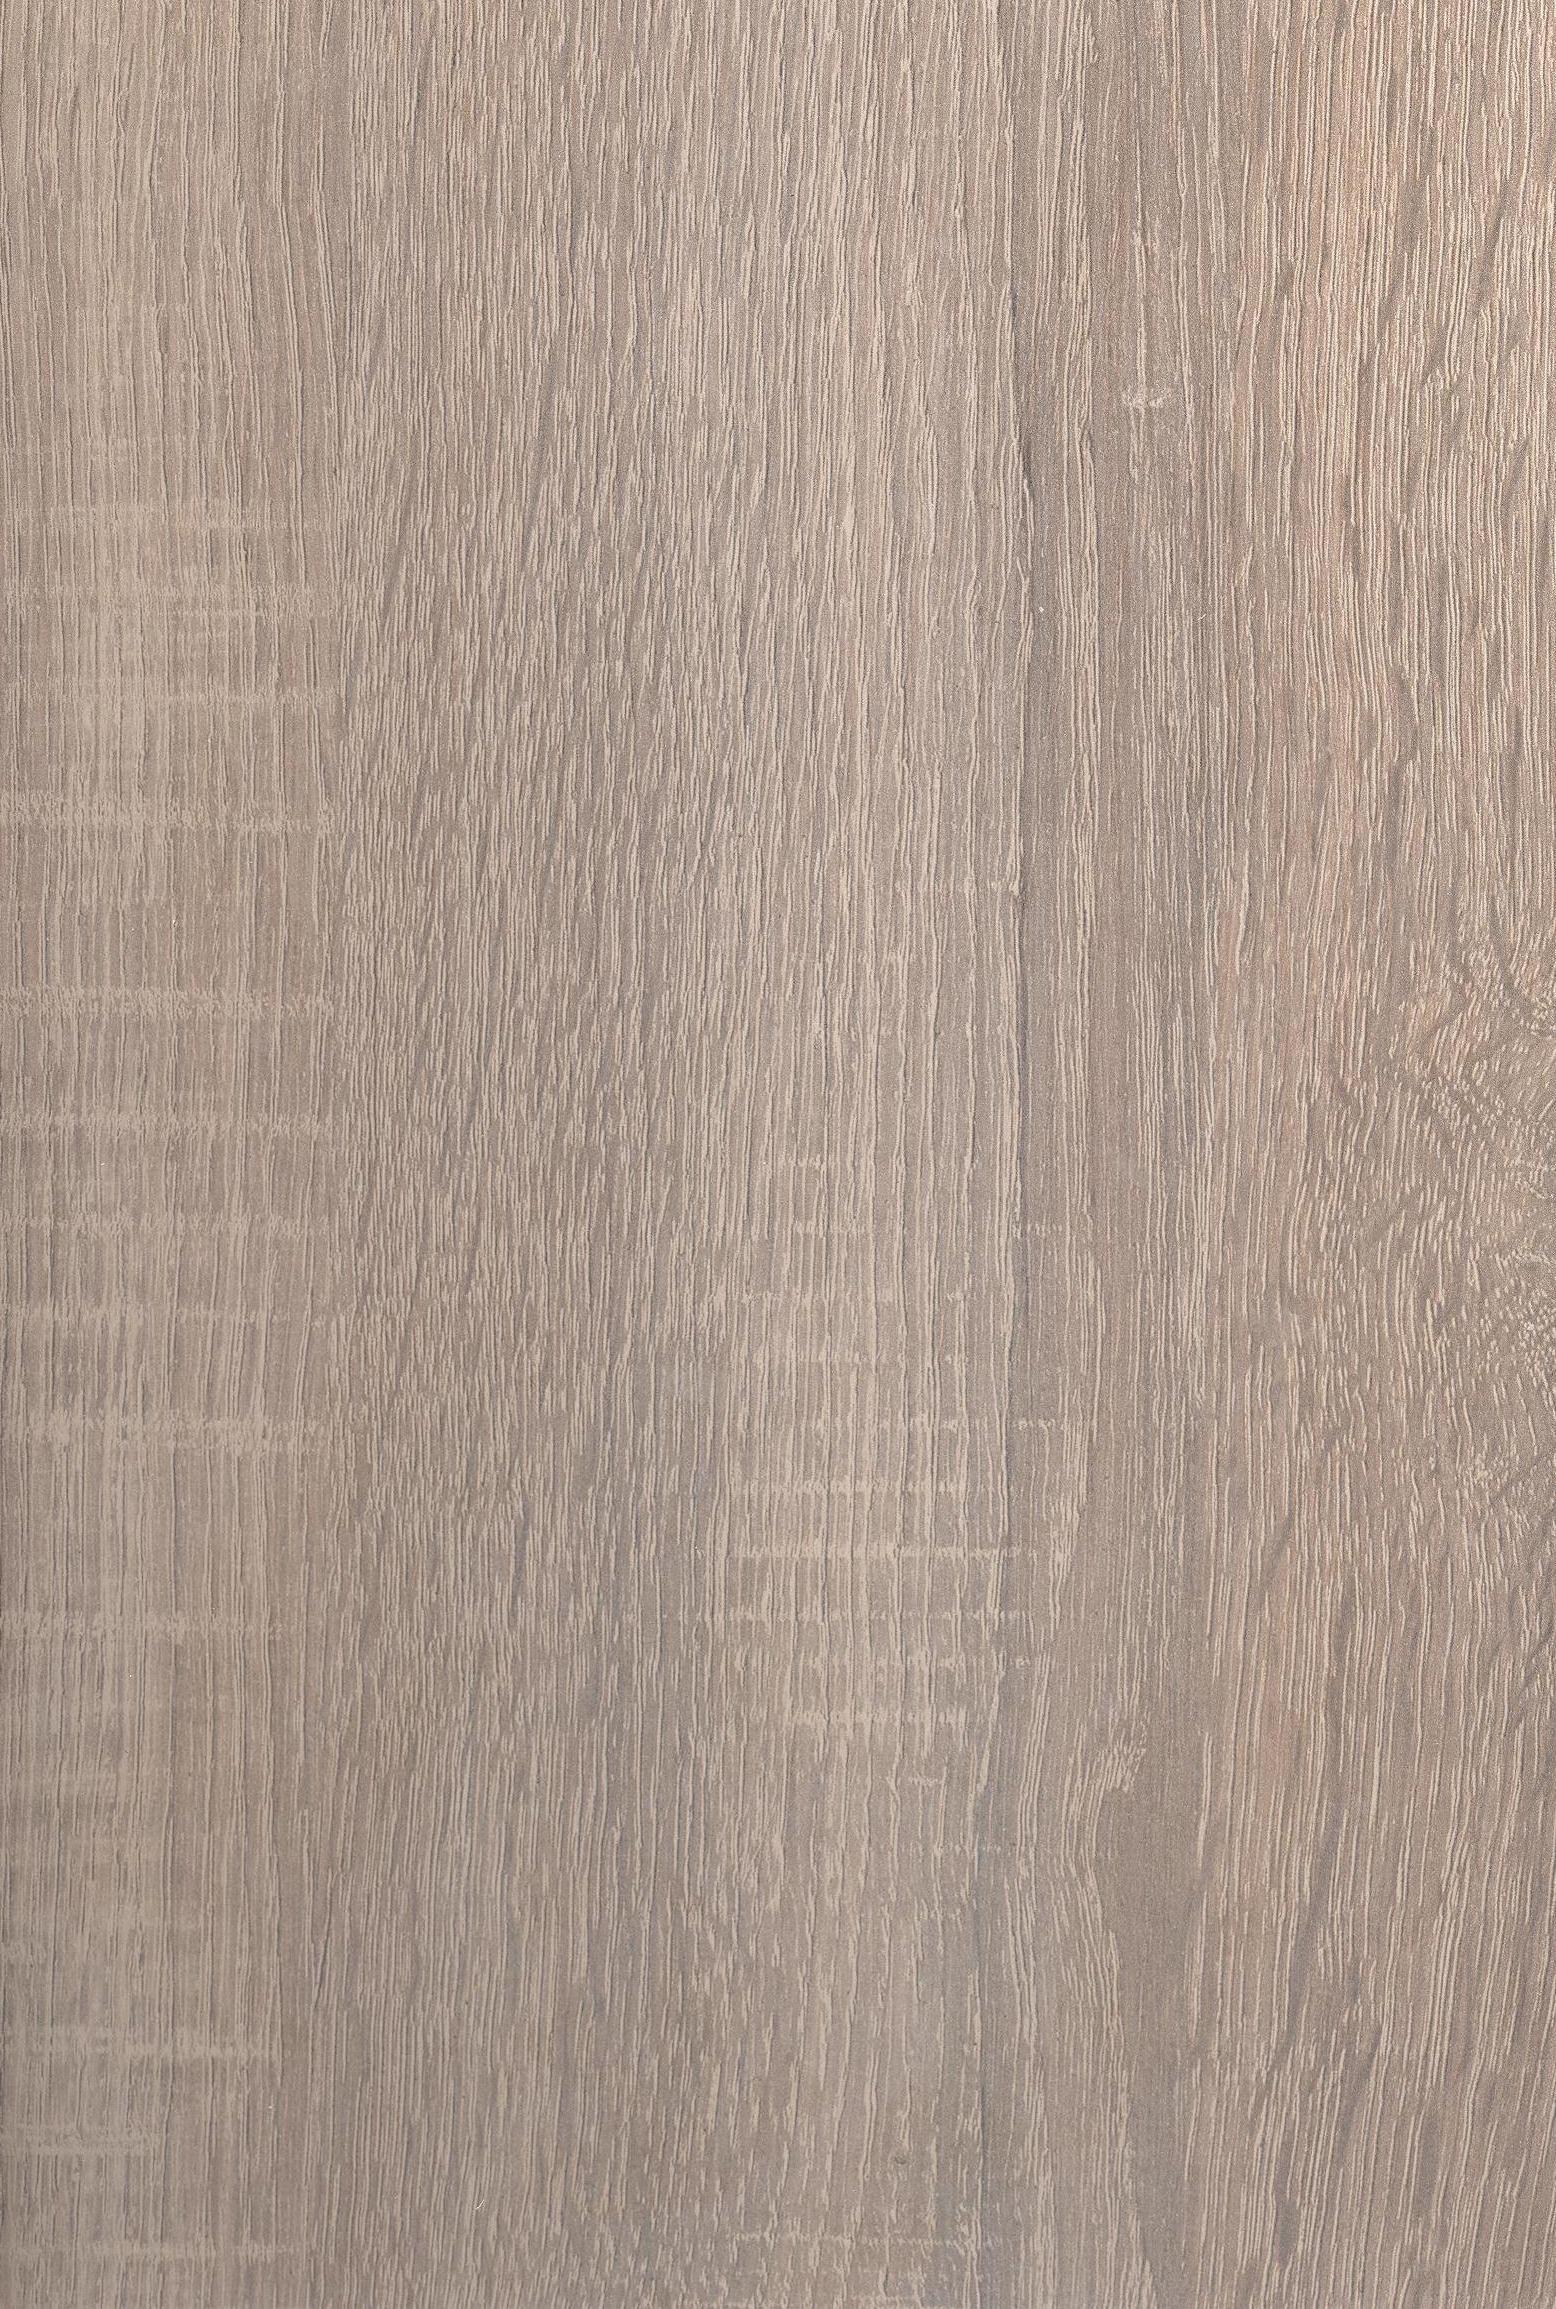 Grey Sonoma Oak 4285